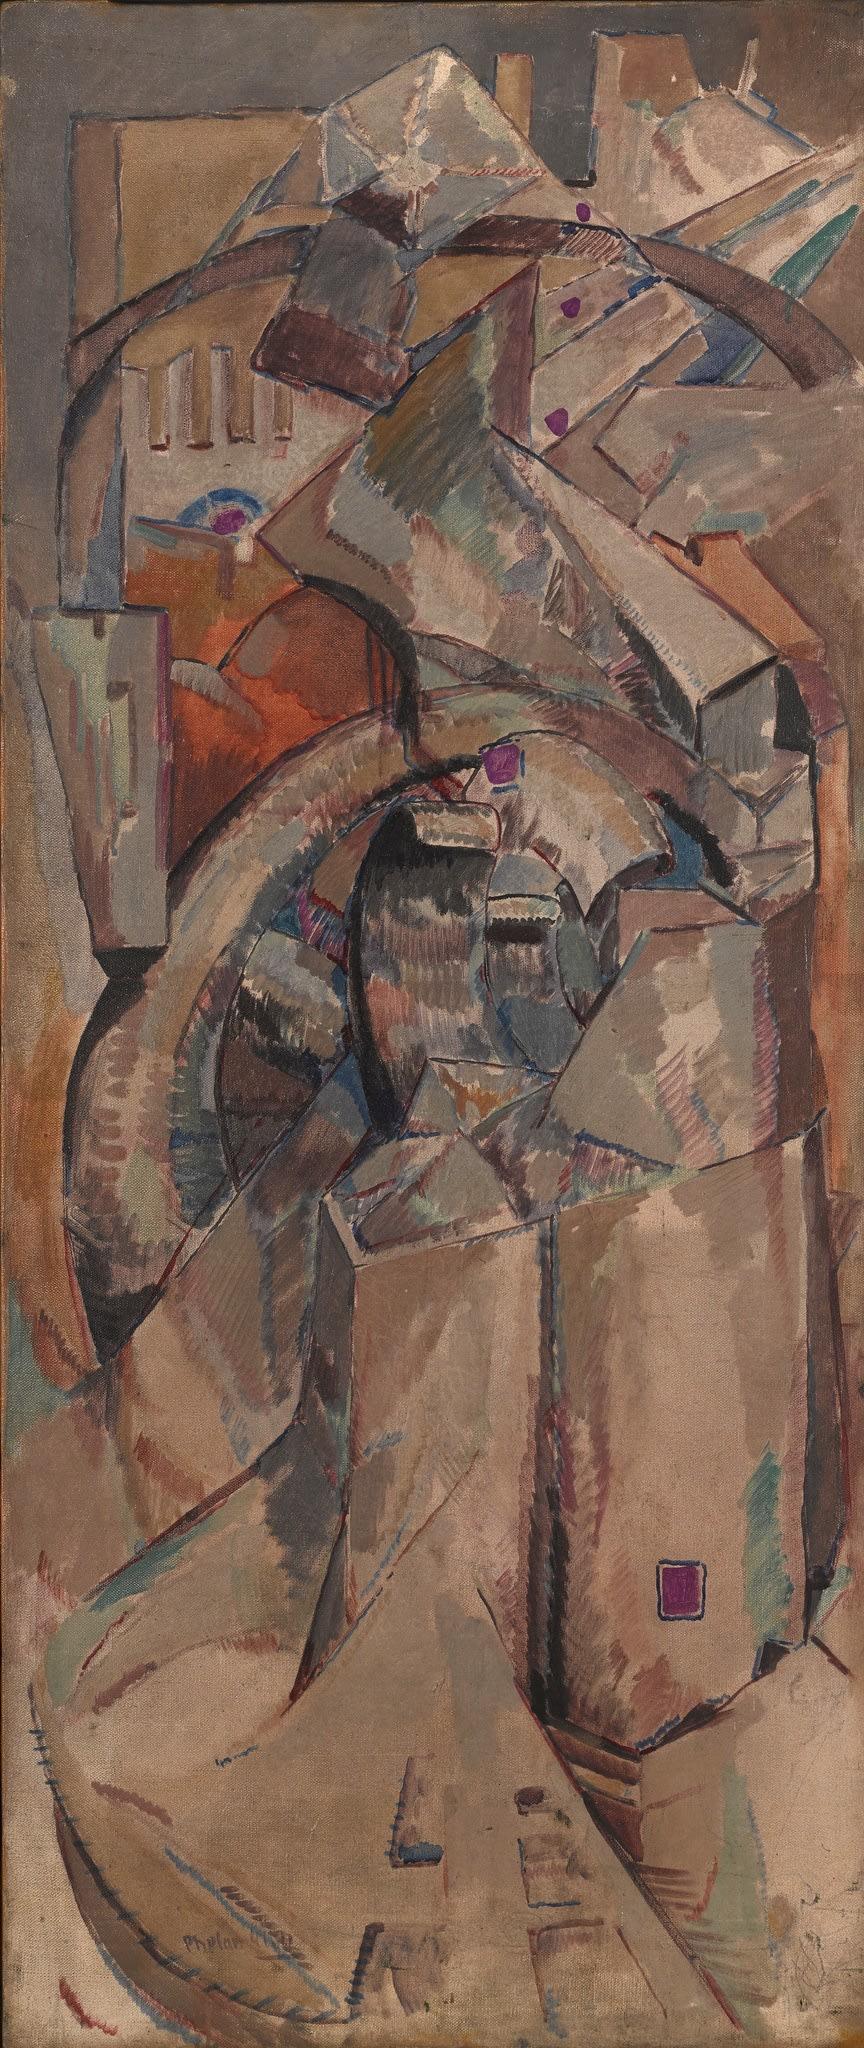 "<span class=""link fancybox-details-link""><a href=""/artists/27-harry-phelan-gibb/works/205-harry-phelan-gibb-untitled-cubist-composition-c.1908/"">View Detail Page</a></span><div class=""artist""><strong>Harry Phelan Gibb</strong></div> 1870 - 1948 <div class=""title""><em>Untitled (cubist composition)</em>, c.1908</div> <div class=""signed_and_dated"">signed lower left</div> <div class=""medium"">oil on canvas</div> <div class=""dimensions"">41 3/4 x 17 3/4 in<br />106 x 45.2 cm</div>"